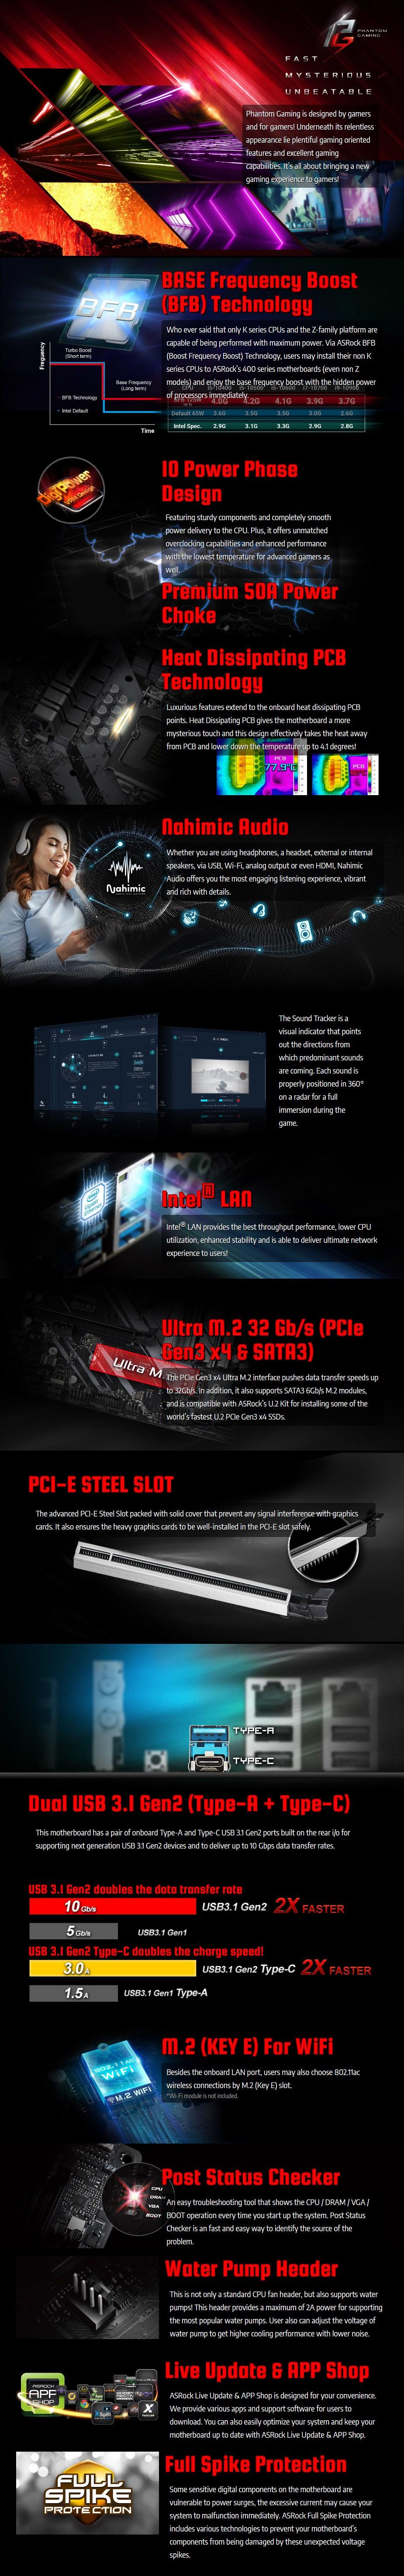 ASRock Z490 Phantom Gaming 4 LGA 1200 ATX Motherboard - Overview 1